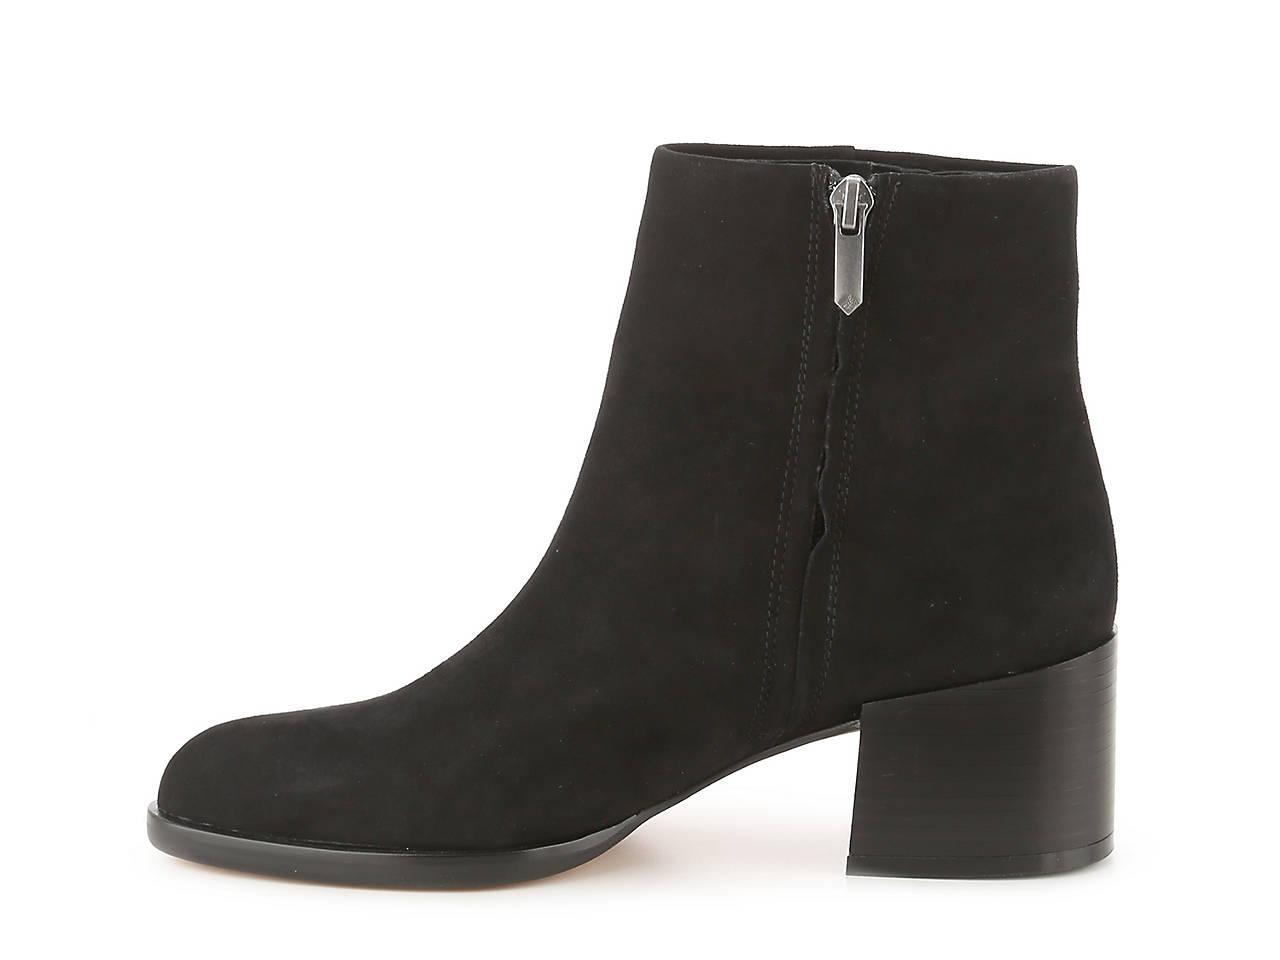 17df1e6b31ef Sam Edelman Joey Bootie Women s Shoes